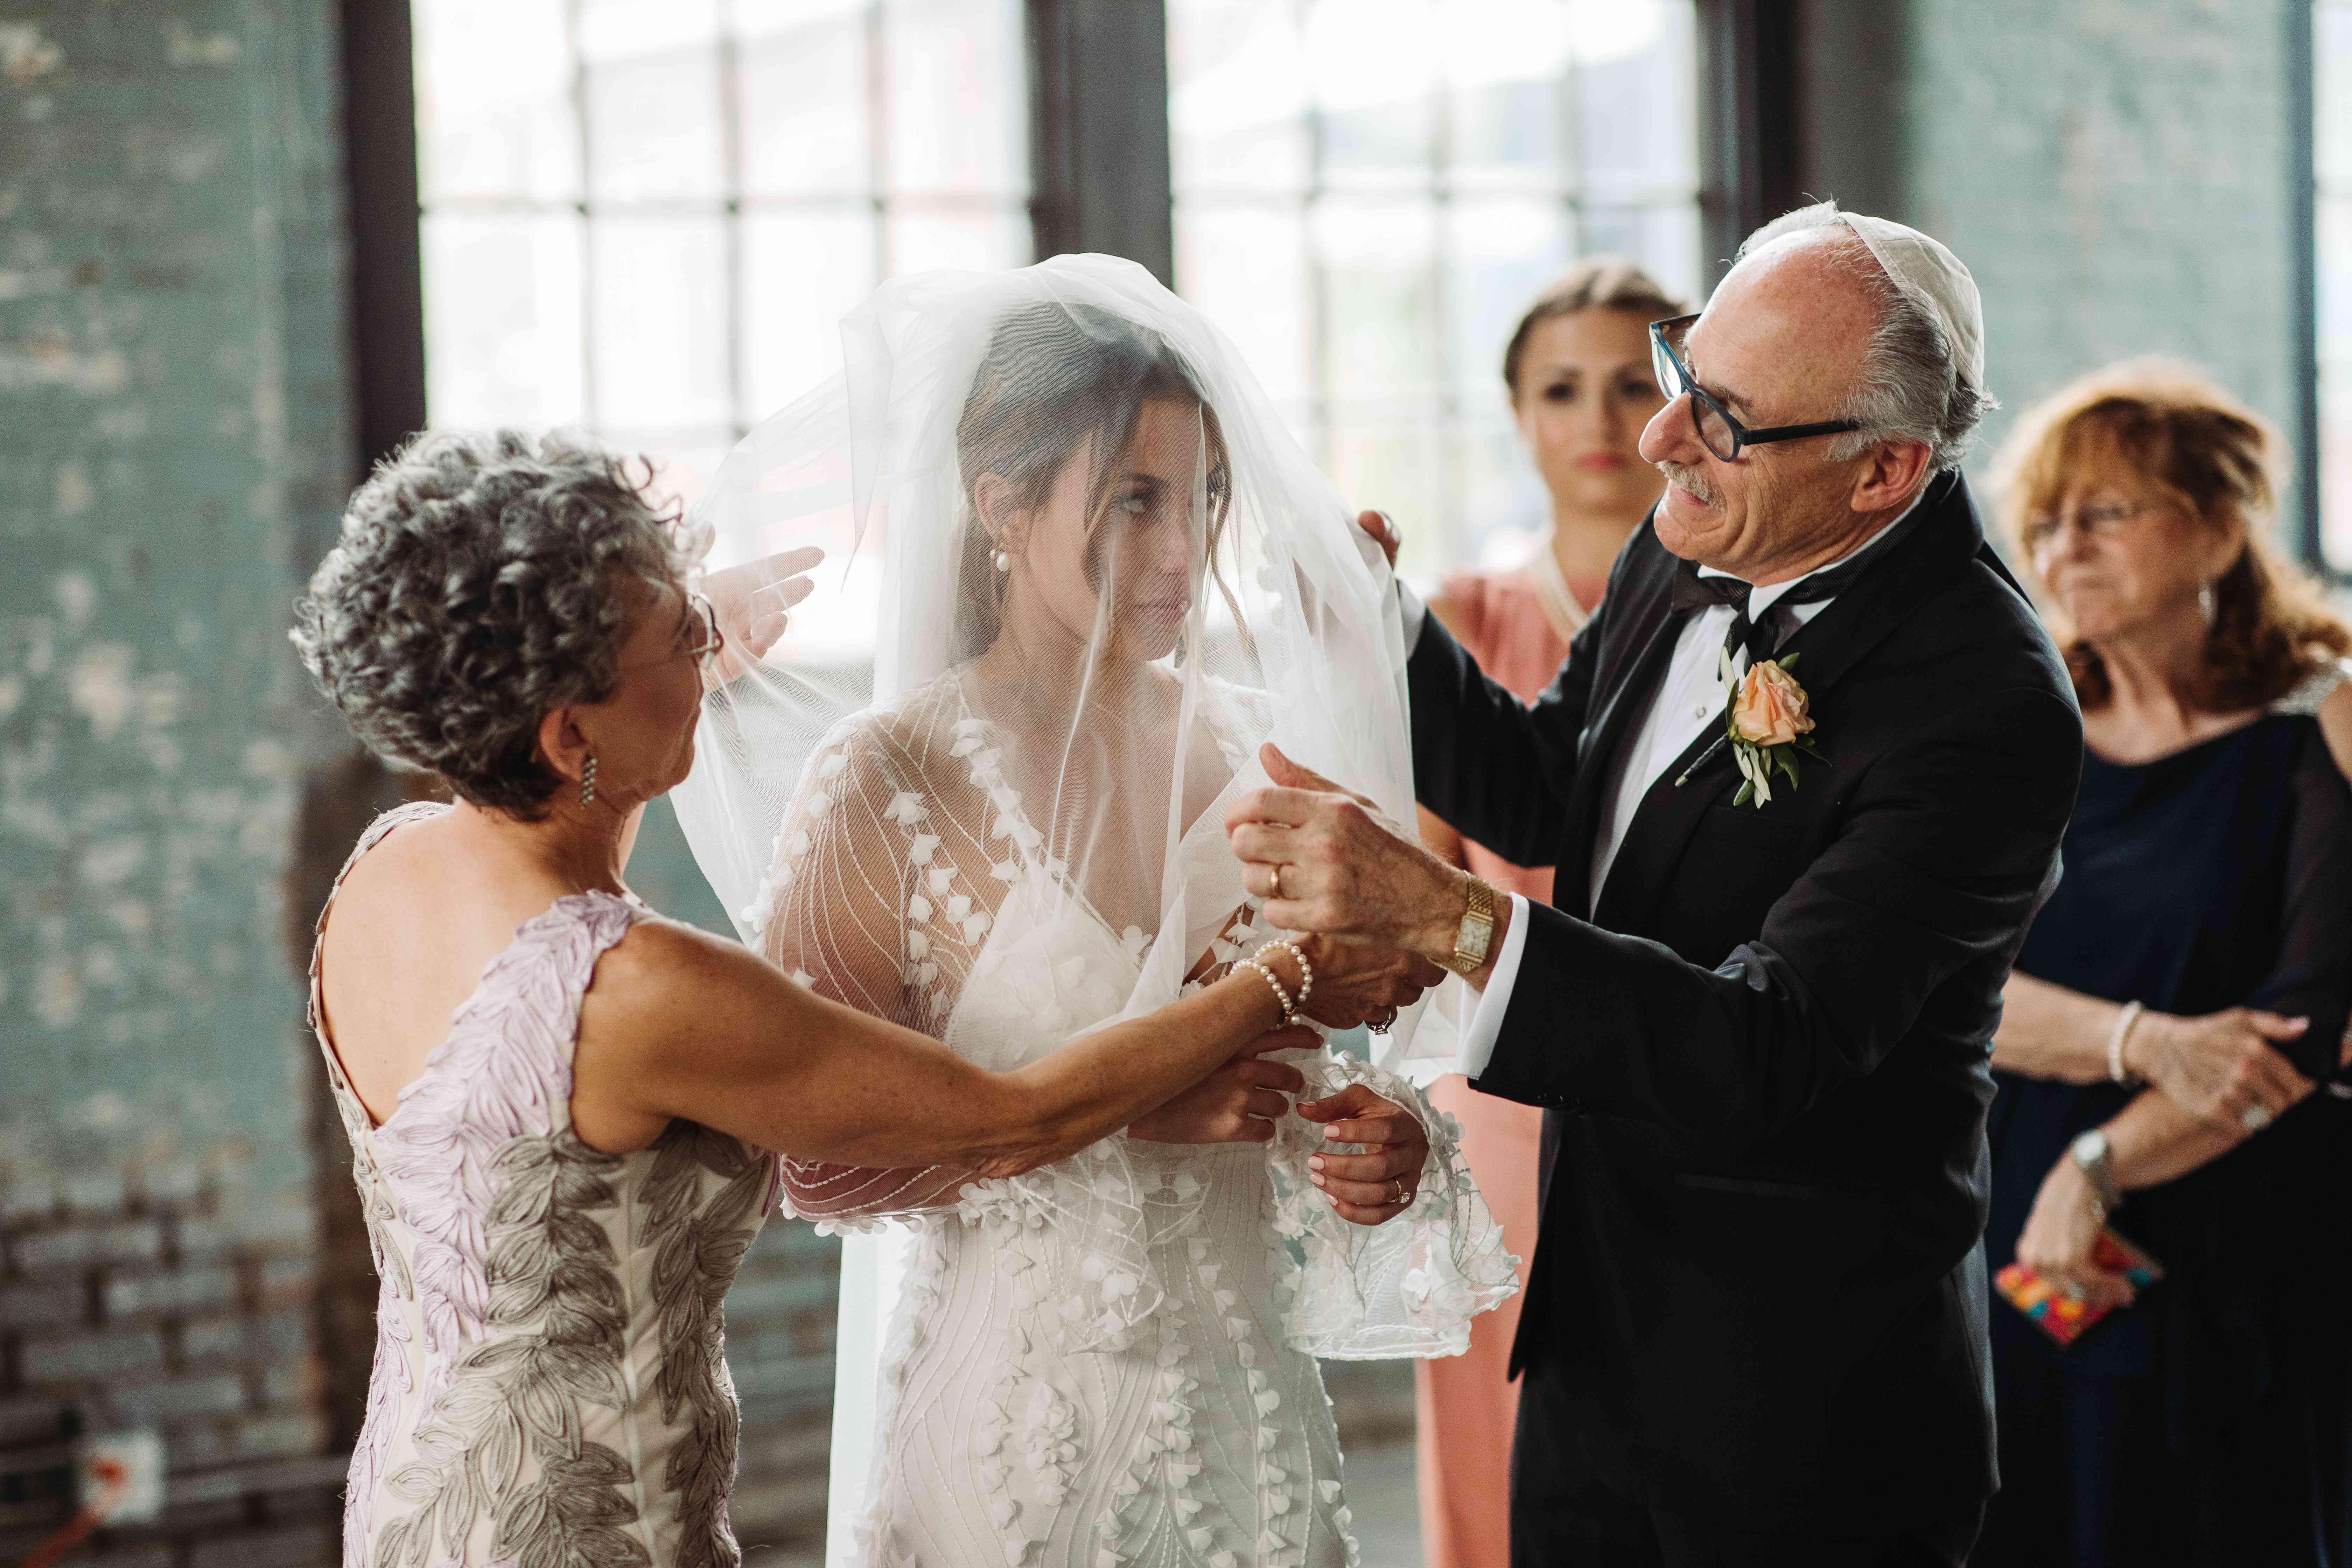 bride's parents fixing veil